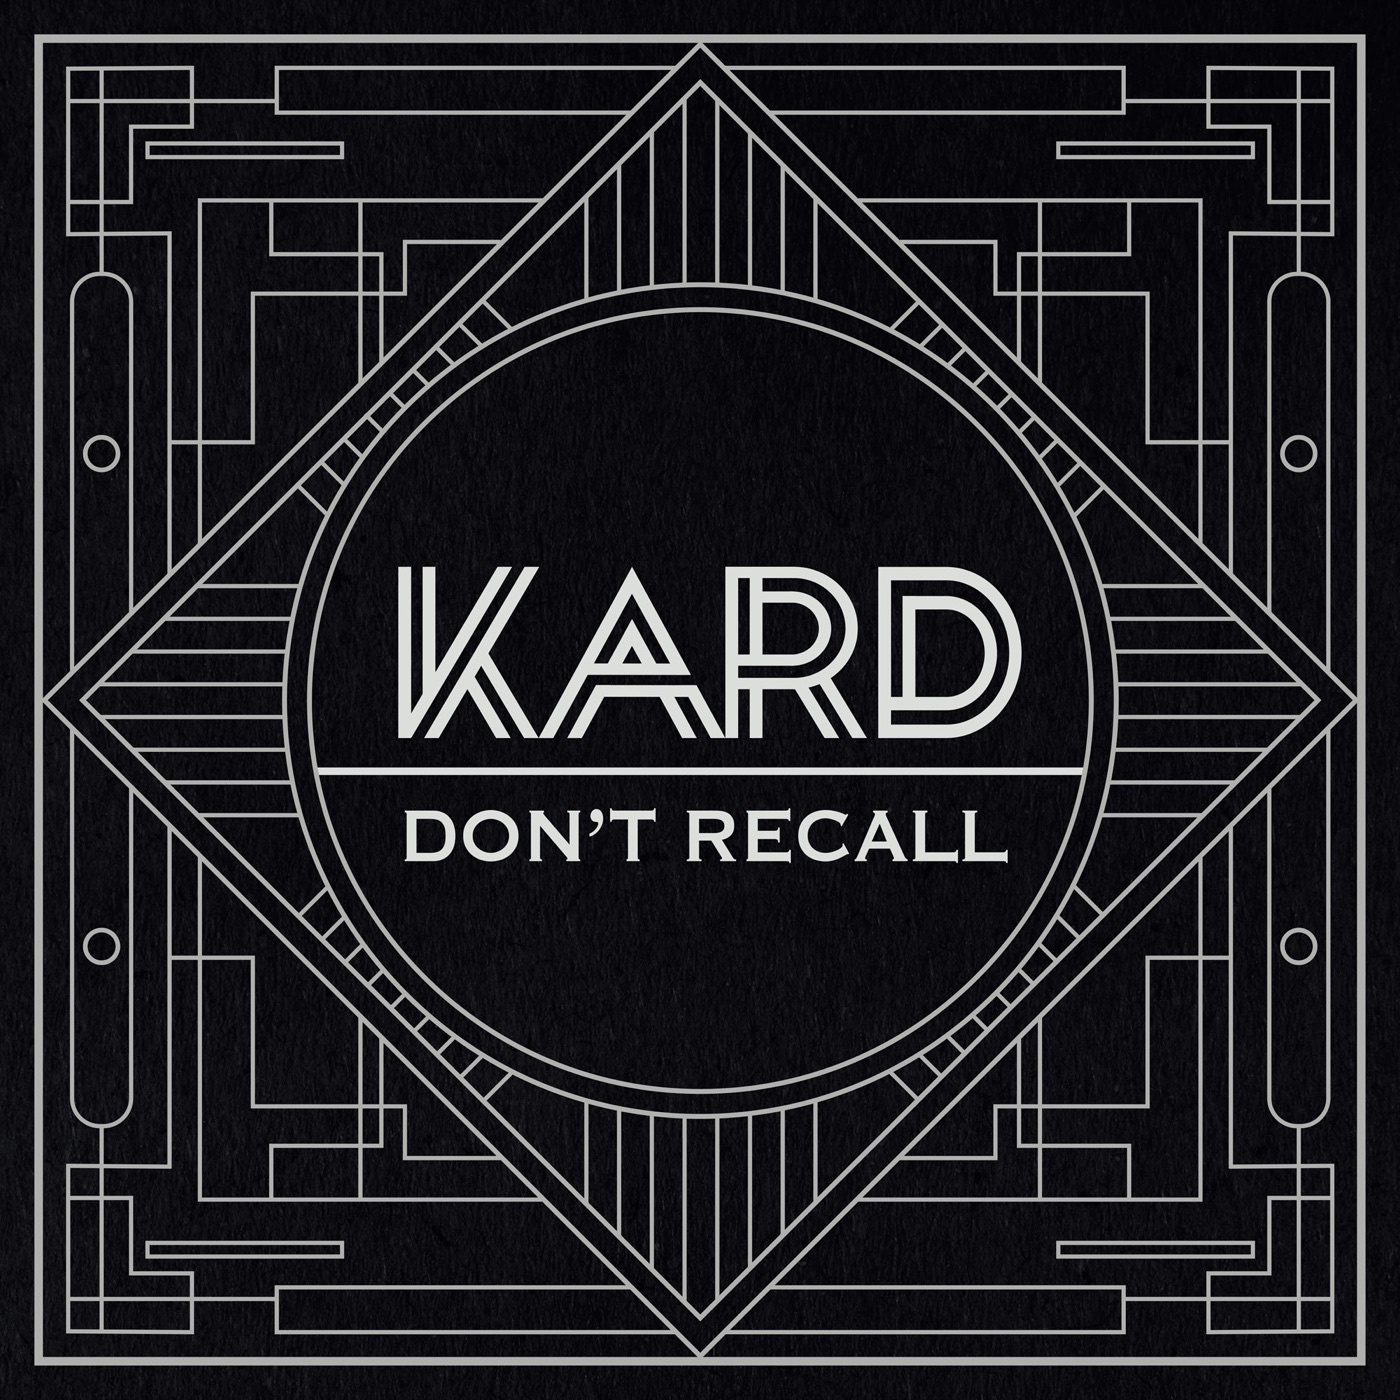 Kard - K.A.R.D Project, Vol. 2 - Don't Recall - Single